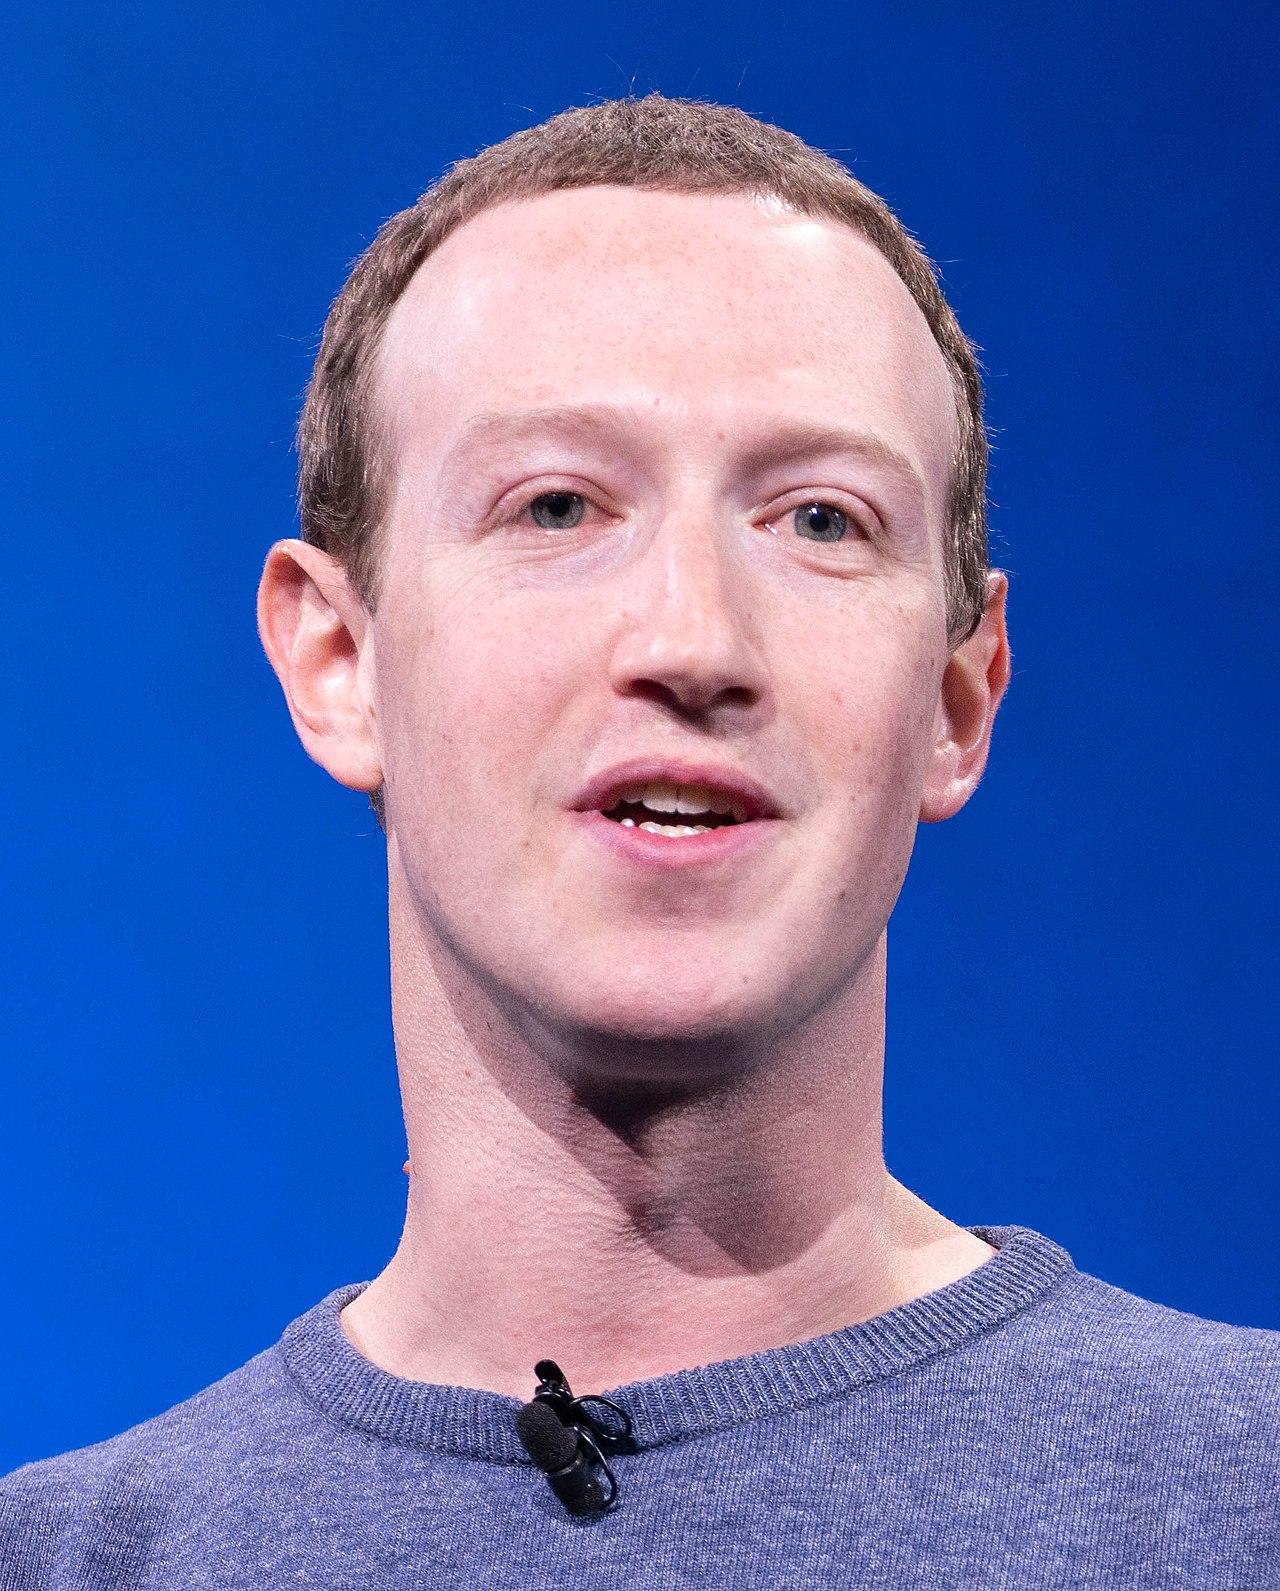 Billionaire Facebook chief Mark Zuckerberg is cracking down on coronavirus misinformation